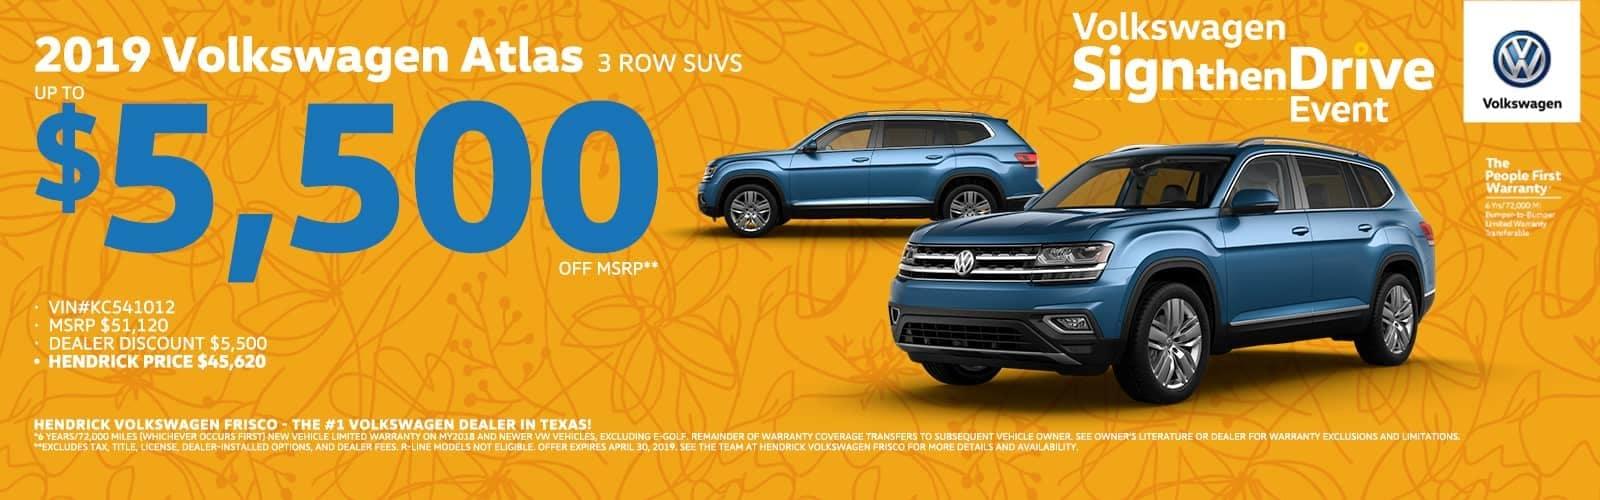 2019 Volkswagen Atlas 3 Row SUVs